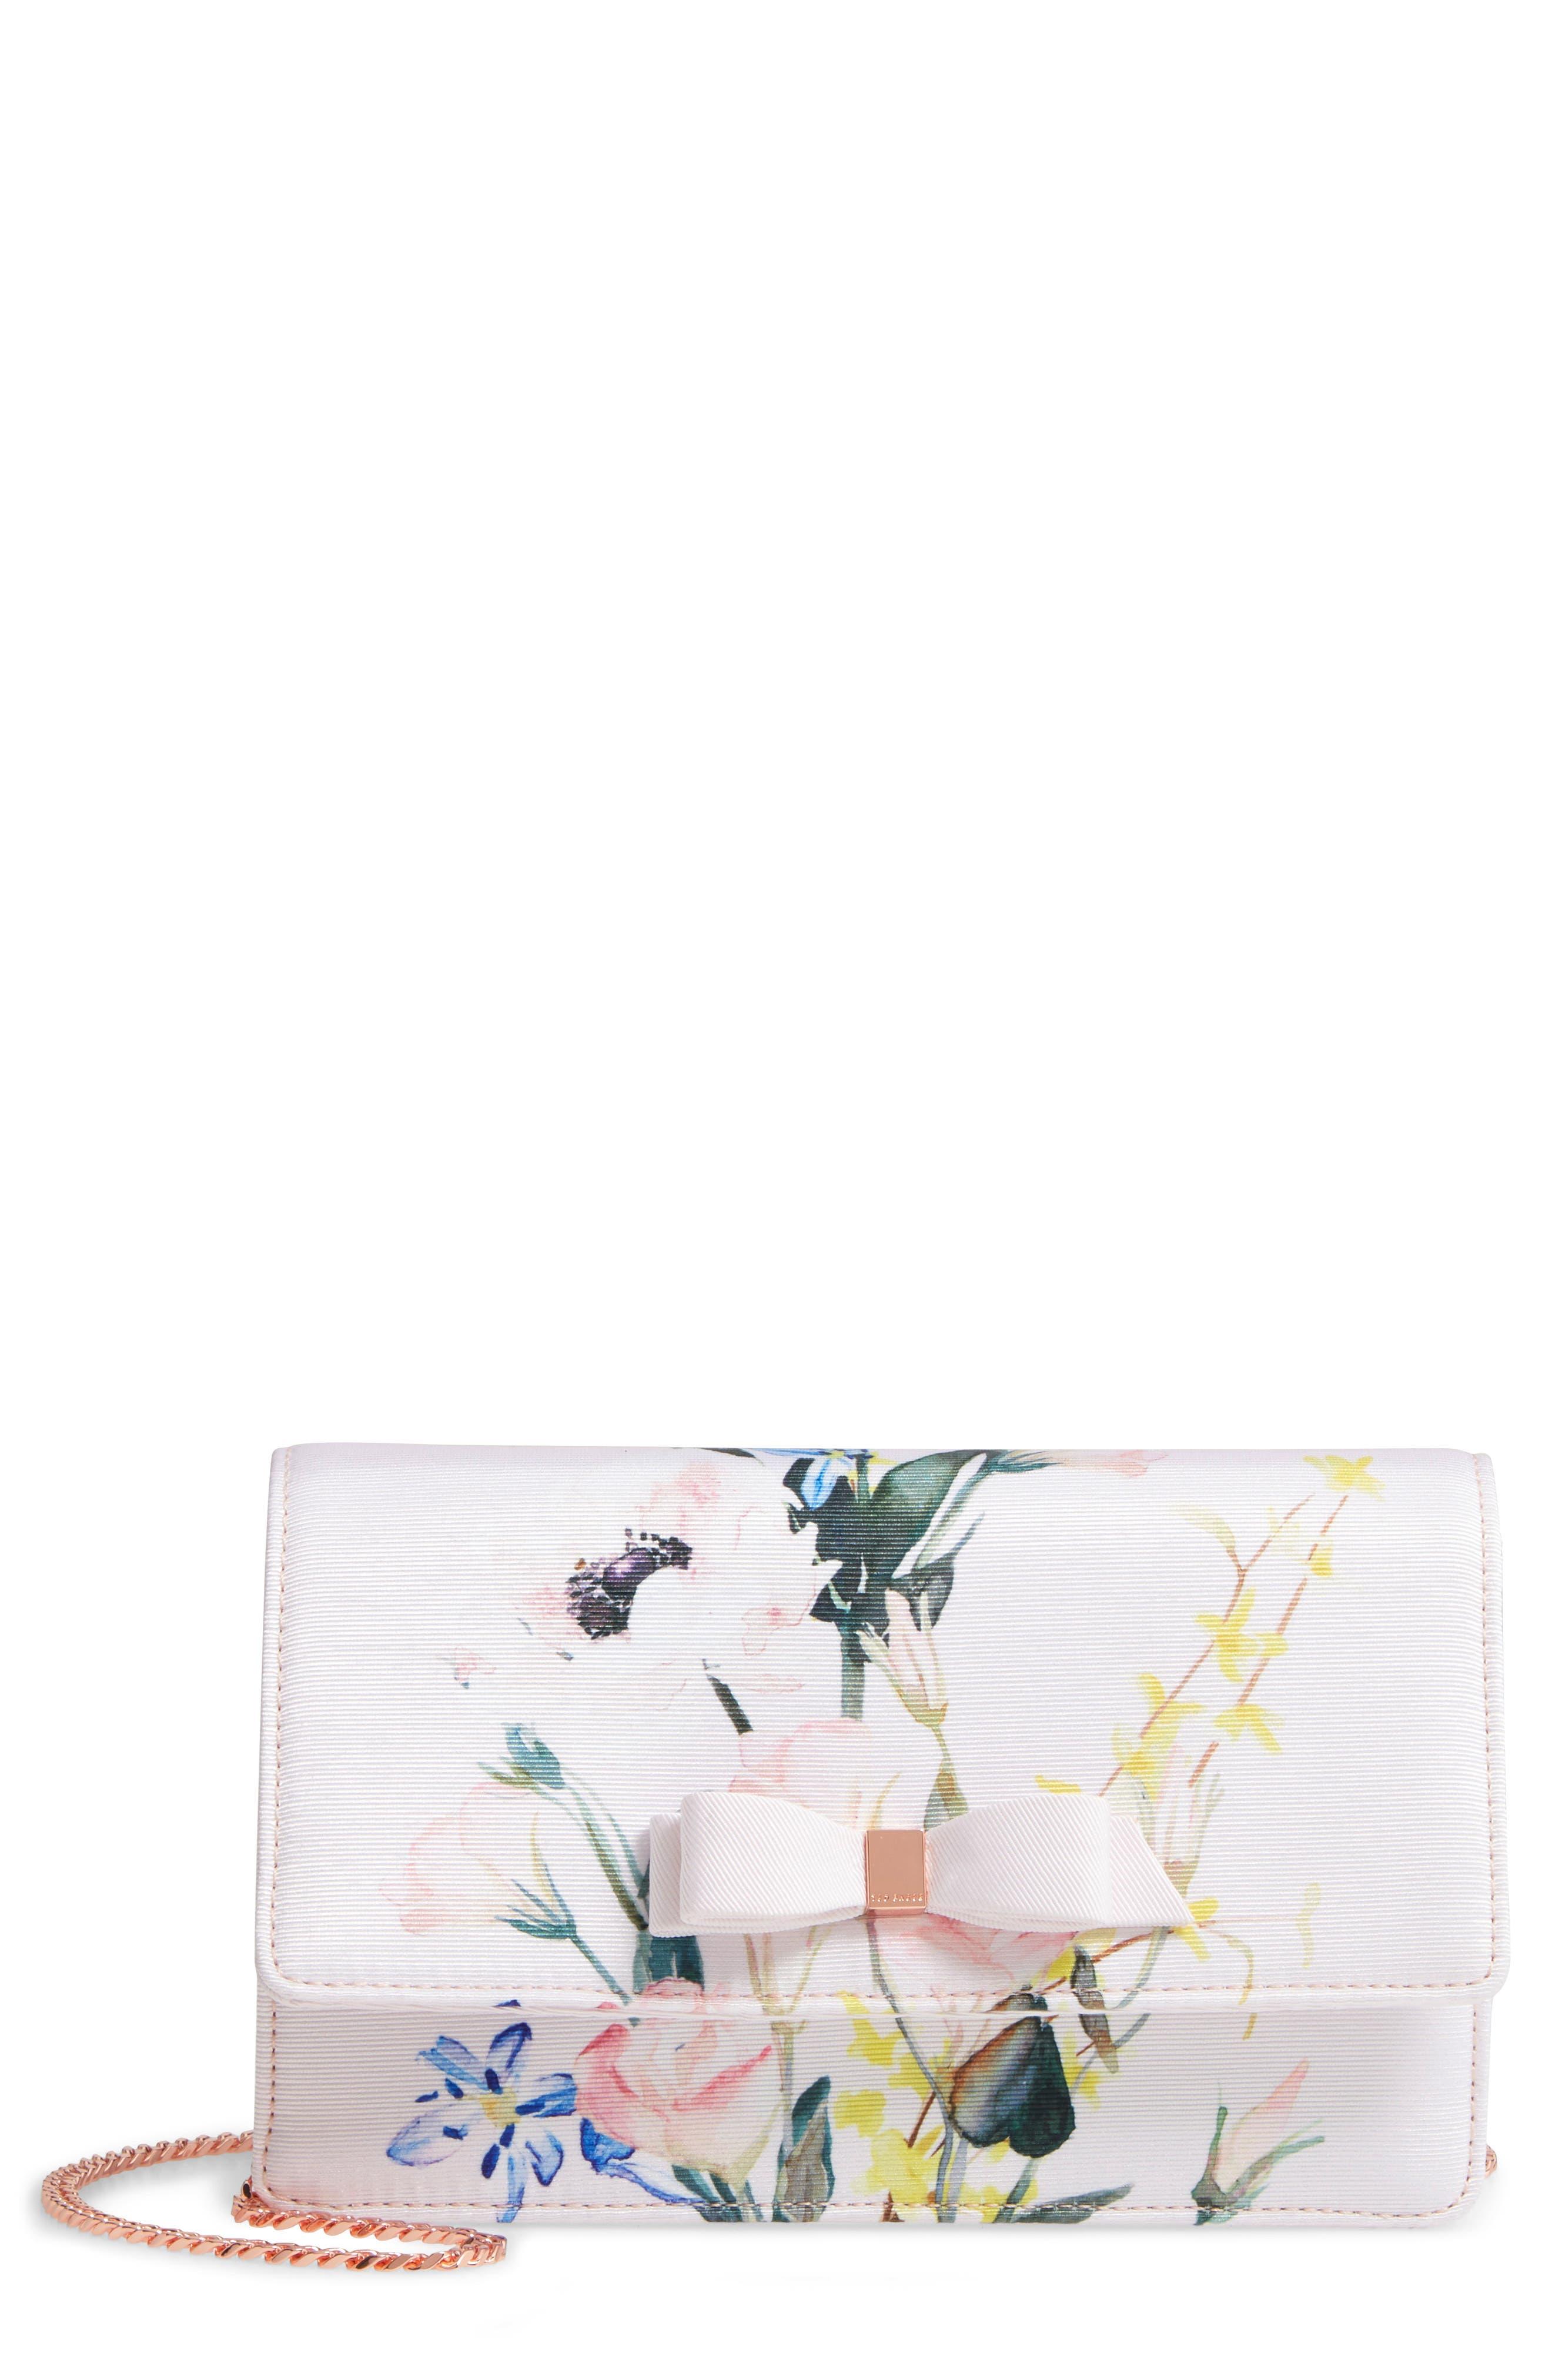 Hania Elegant Bow Evening Bag,                             Main thumbnail 1, color,                             NUDE PINK